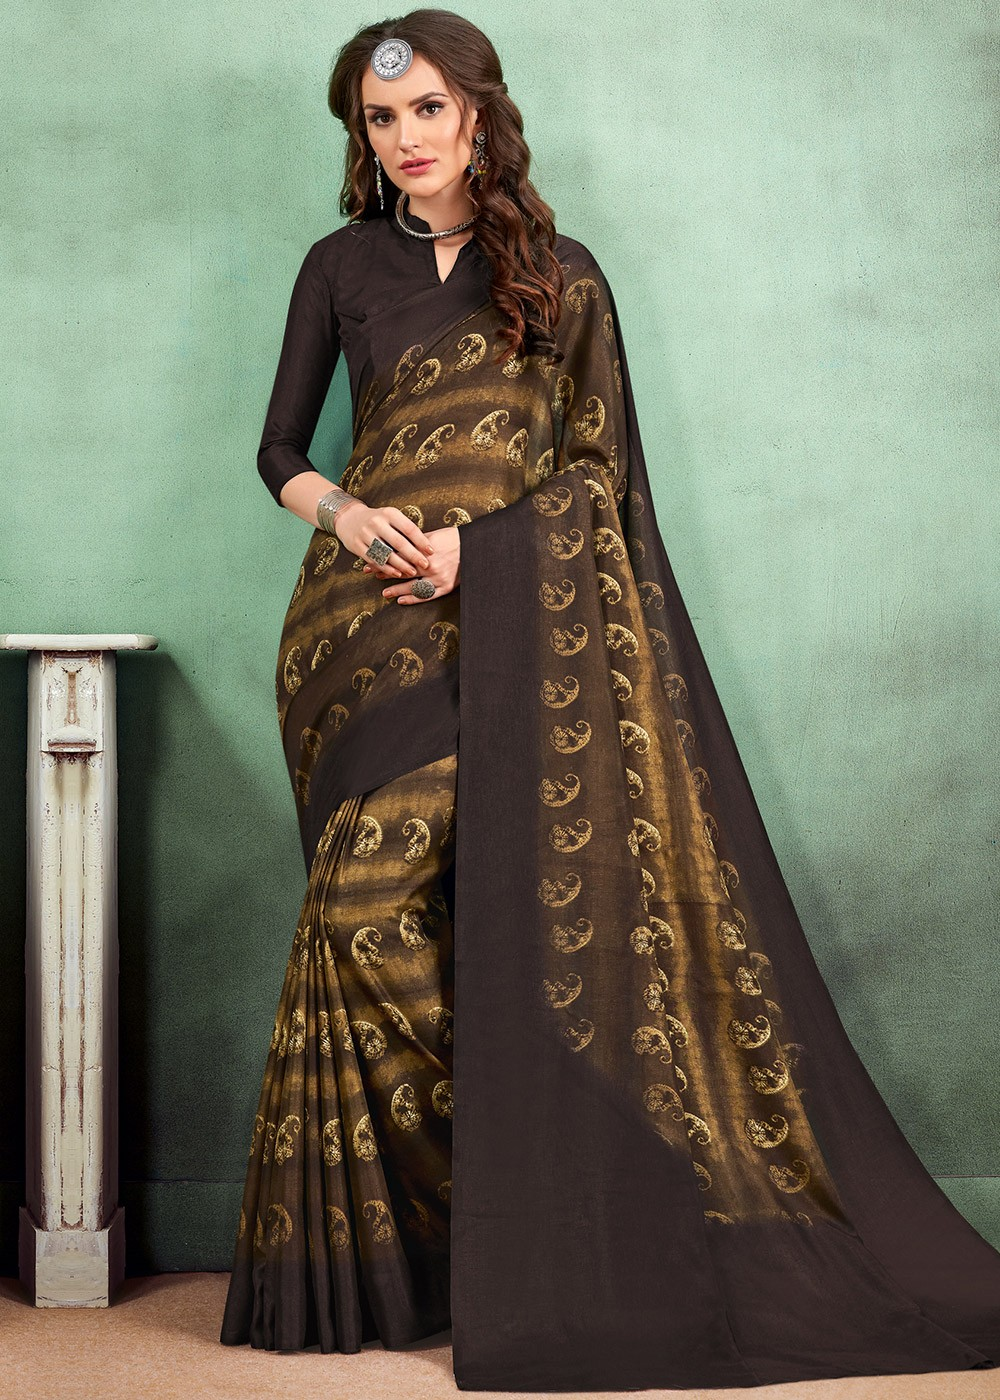 bf8ce215b347b3 Brown And Black Digital Printed Art Silk Saree. Tap to expand